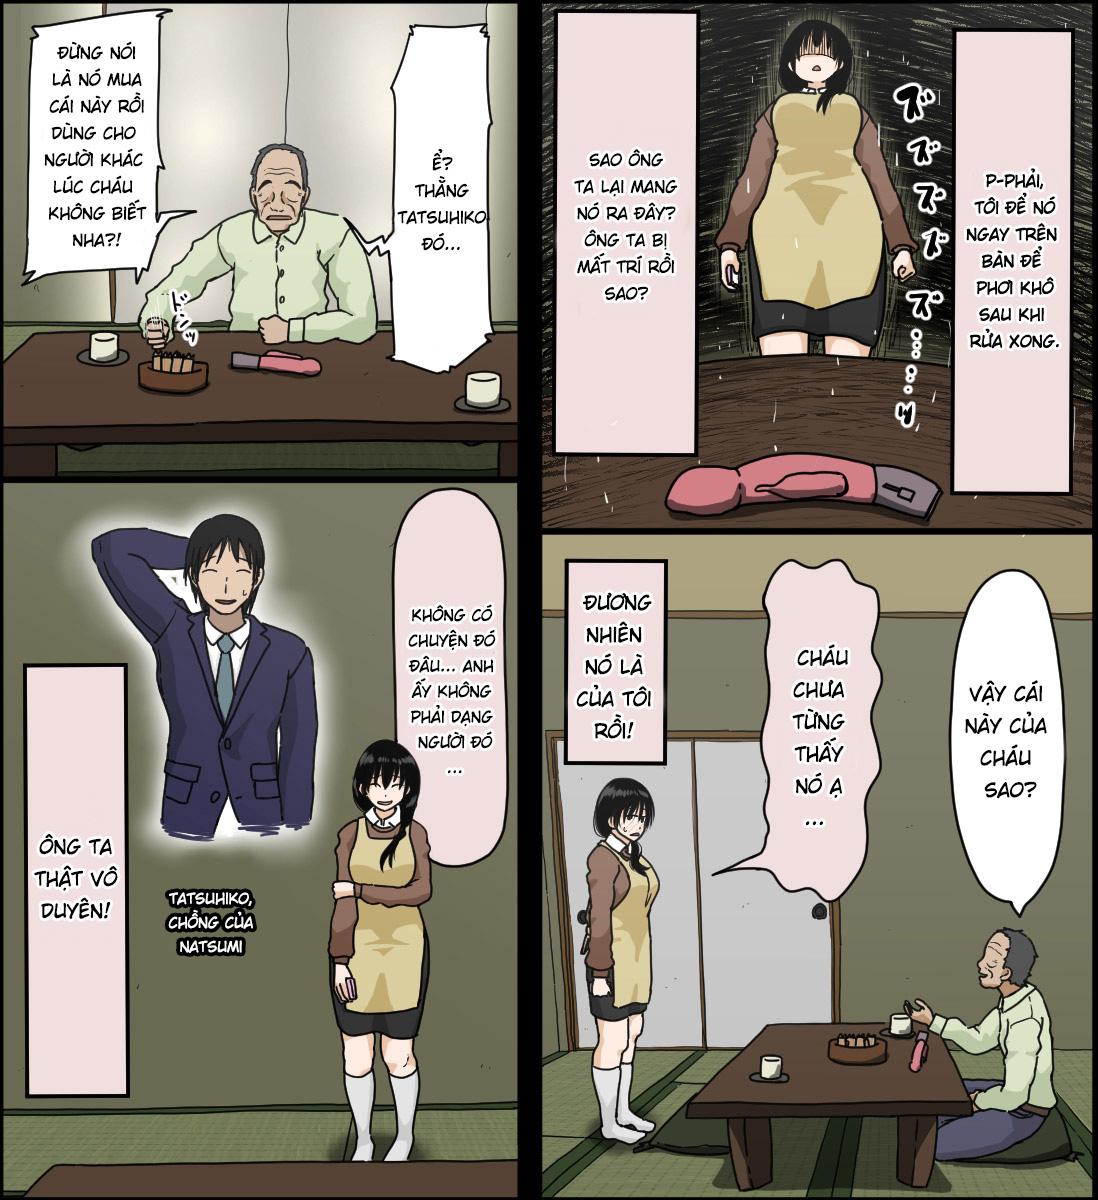 HentaiVN.net - Ảnh 5 - Sasaki Natsumi no Shikyuu ga Ochita Hi - 佐々木夏実の子宮が堕ちた日 - Full ( gộp 3 chap )